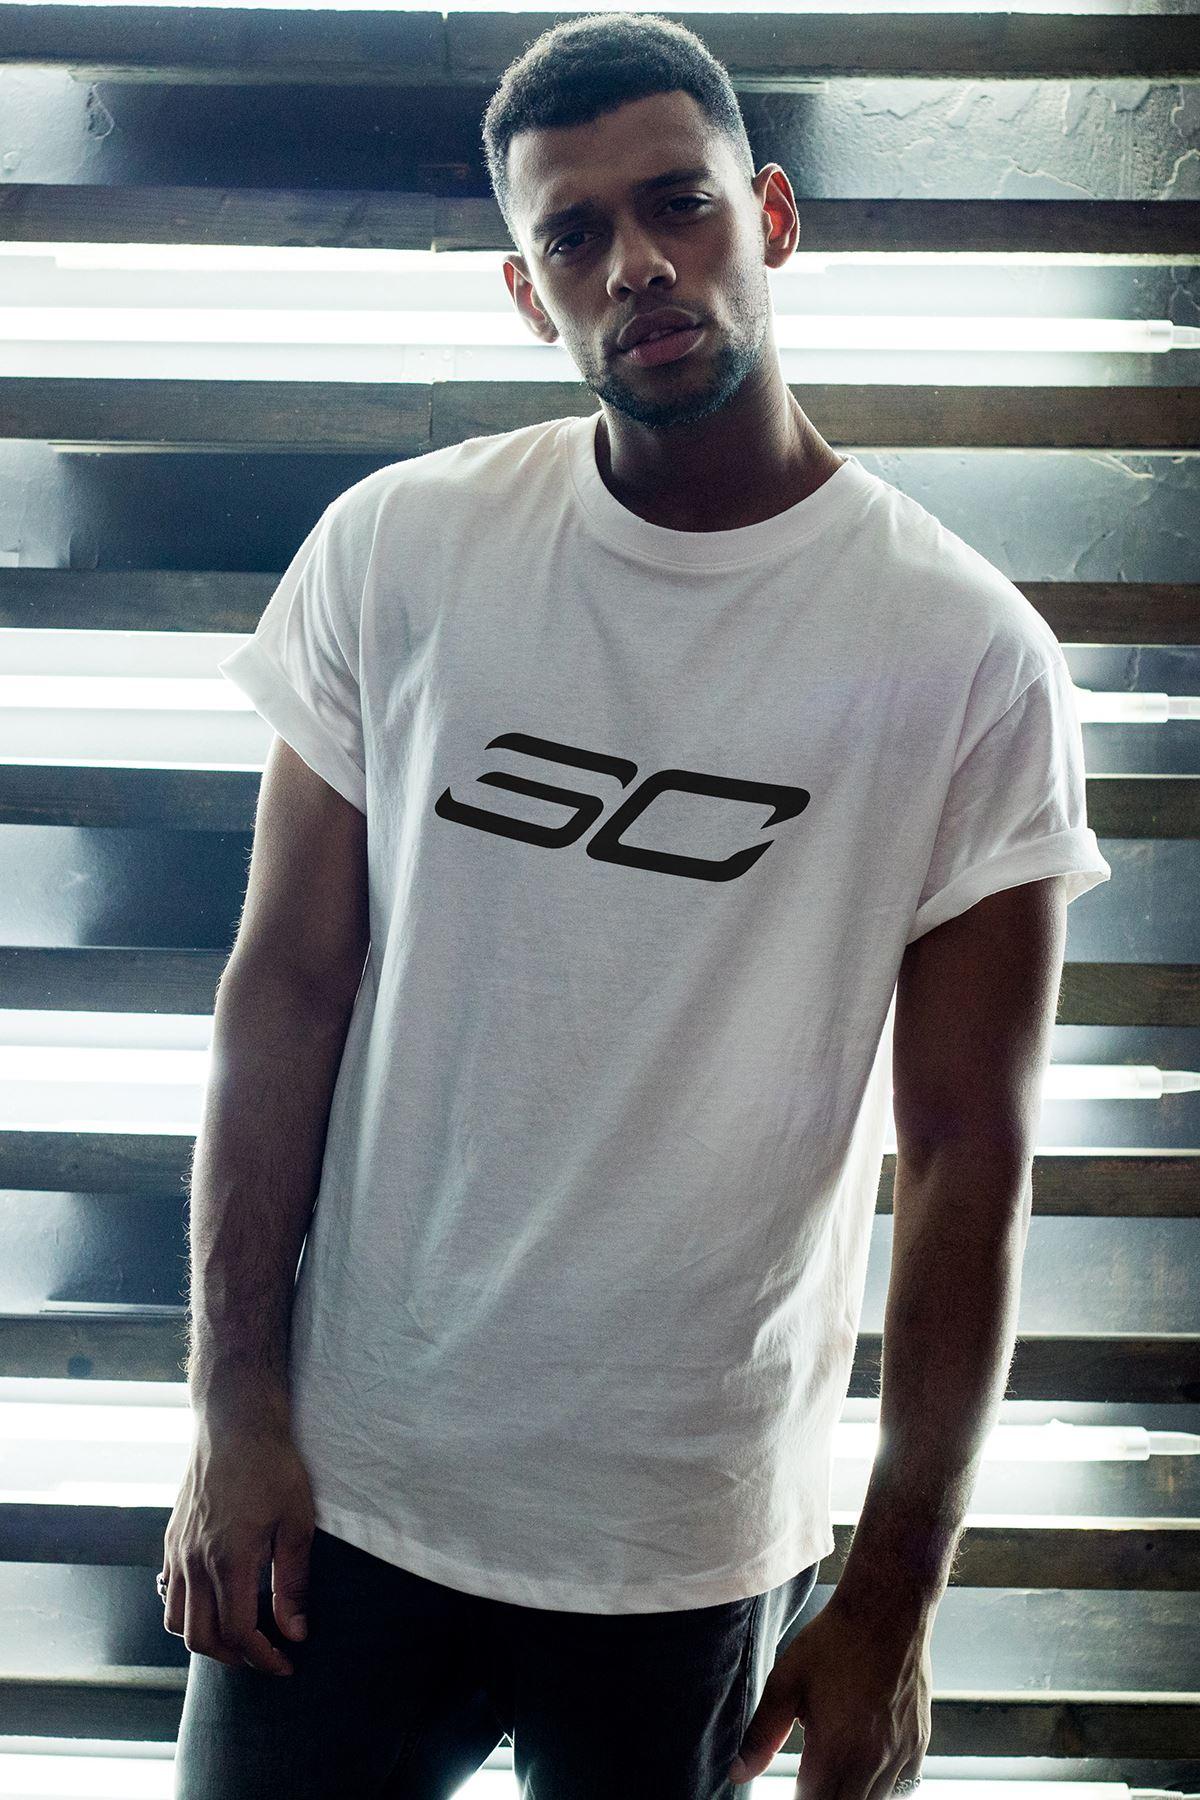 Stephen Curry 149 Beyaz Erkek Oversize Tshirt - Tişört